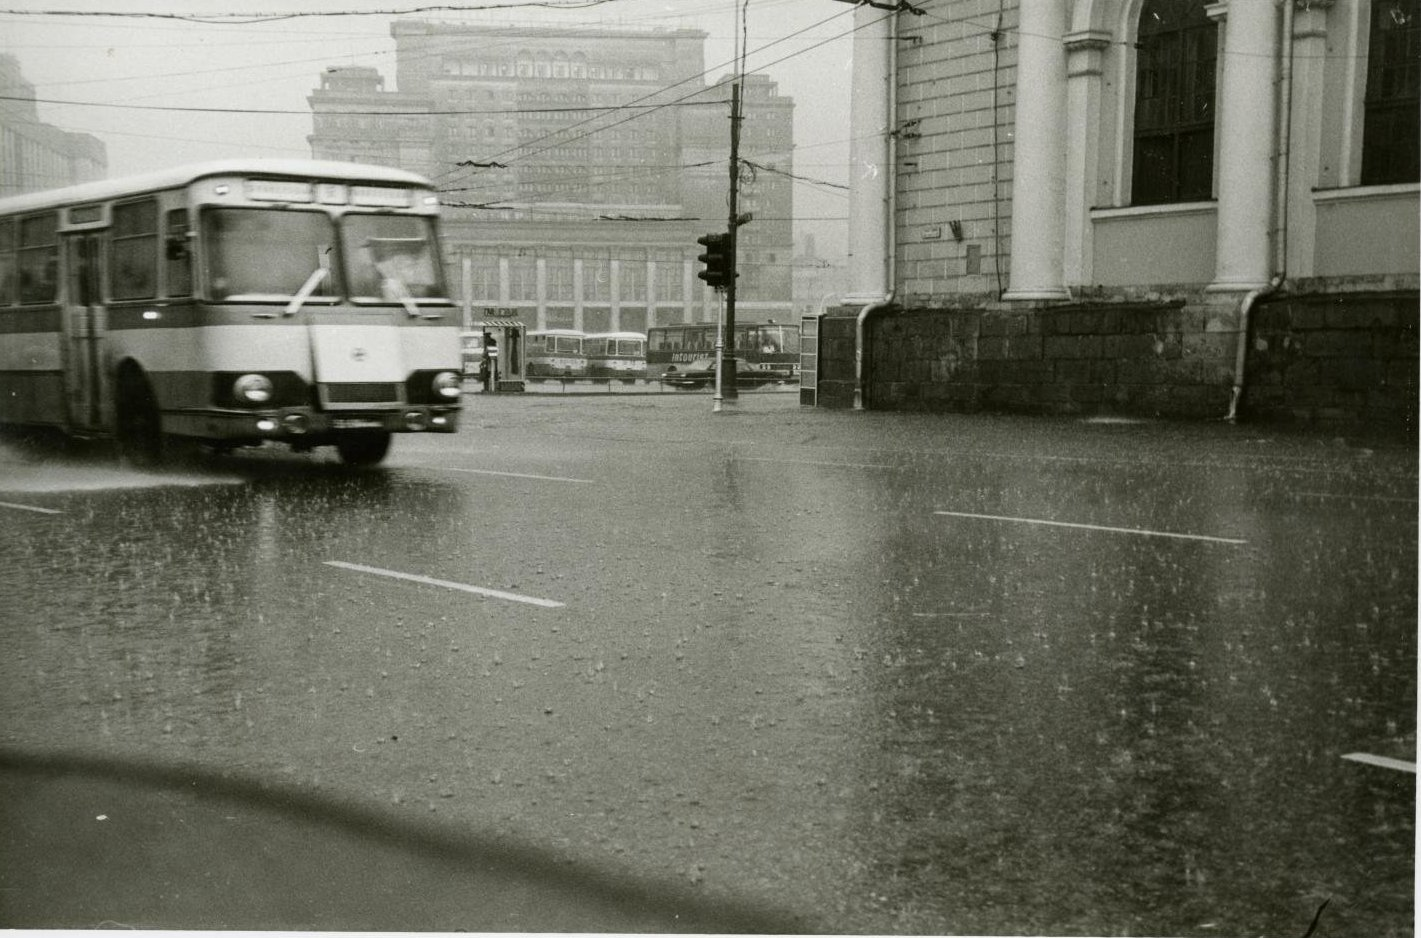 1970-е. Вид на гостиницу «Москва» и движущийся перед ней транспорт во время сильного дождя (6)